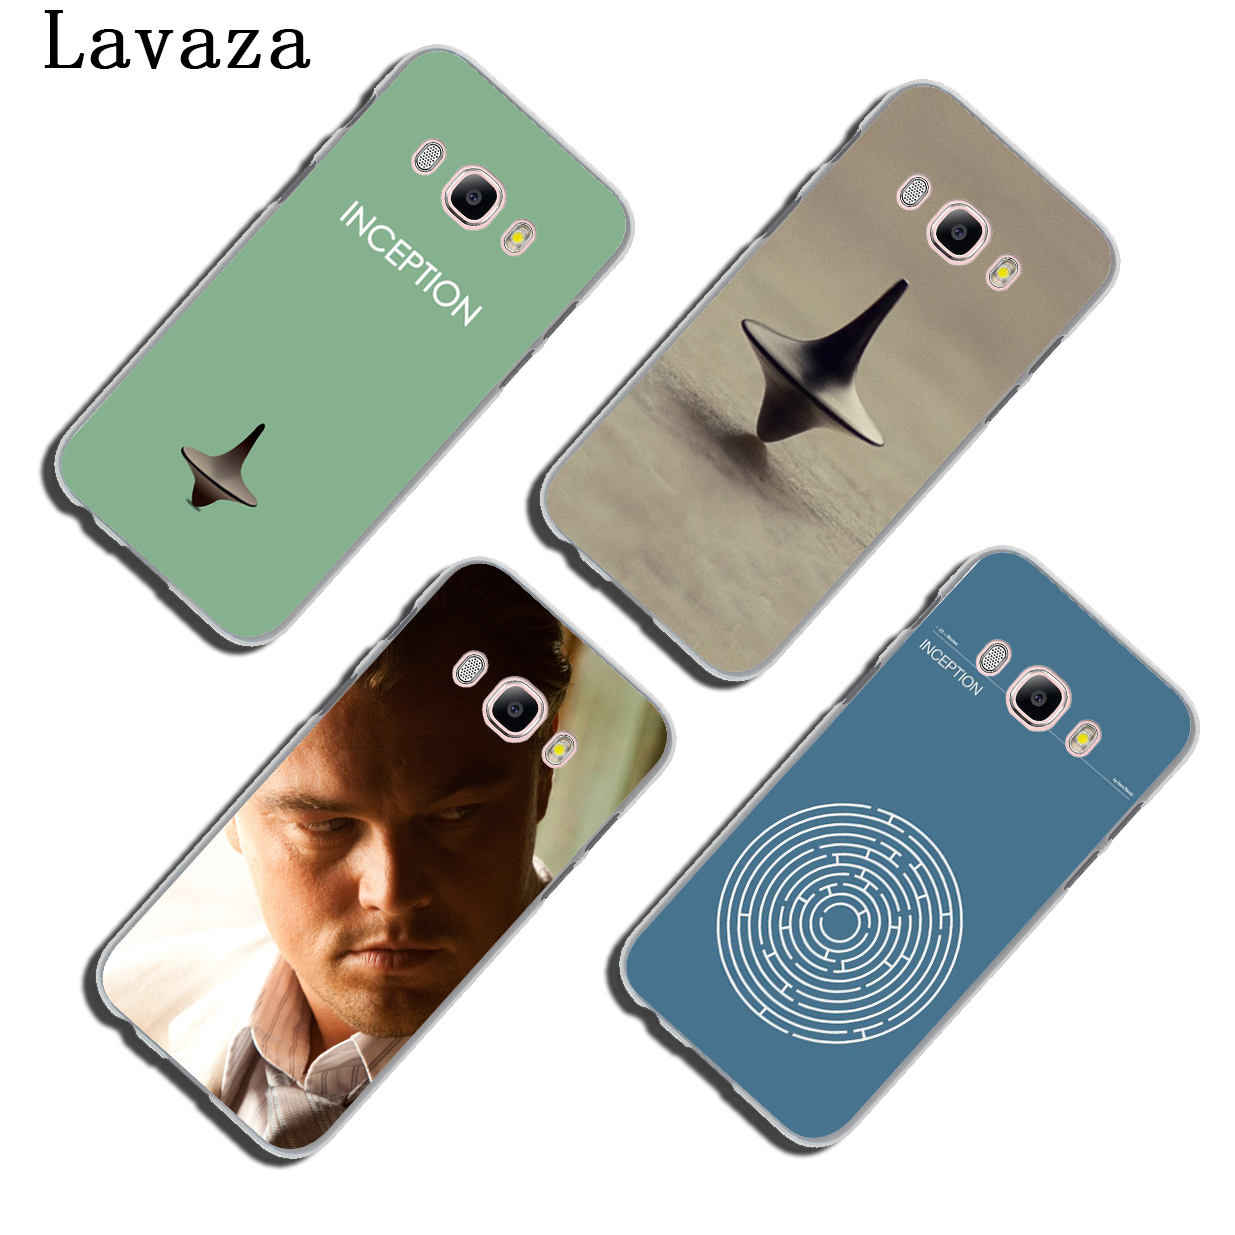 Lavaza Леонардо Ди Каприо создания телефон чехла для samsung Galaxy J3 J1 J2 J5 J7 2015 2016 2017 J2 Ace pro J5 Прайм Cover